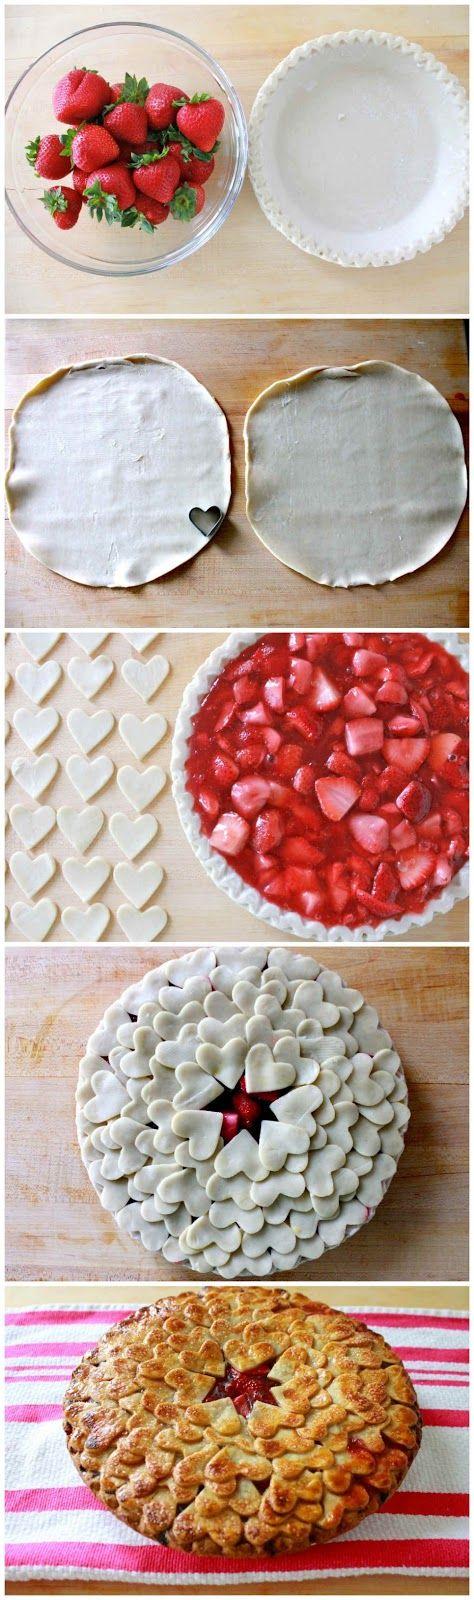 Strawberry Heart Pie - Recipebest